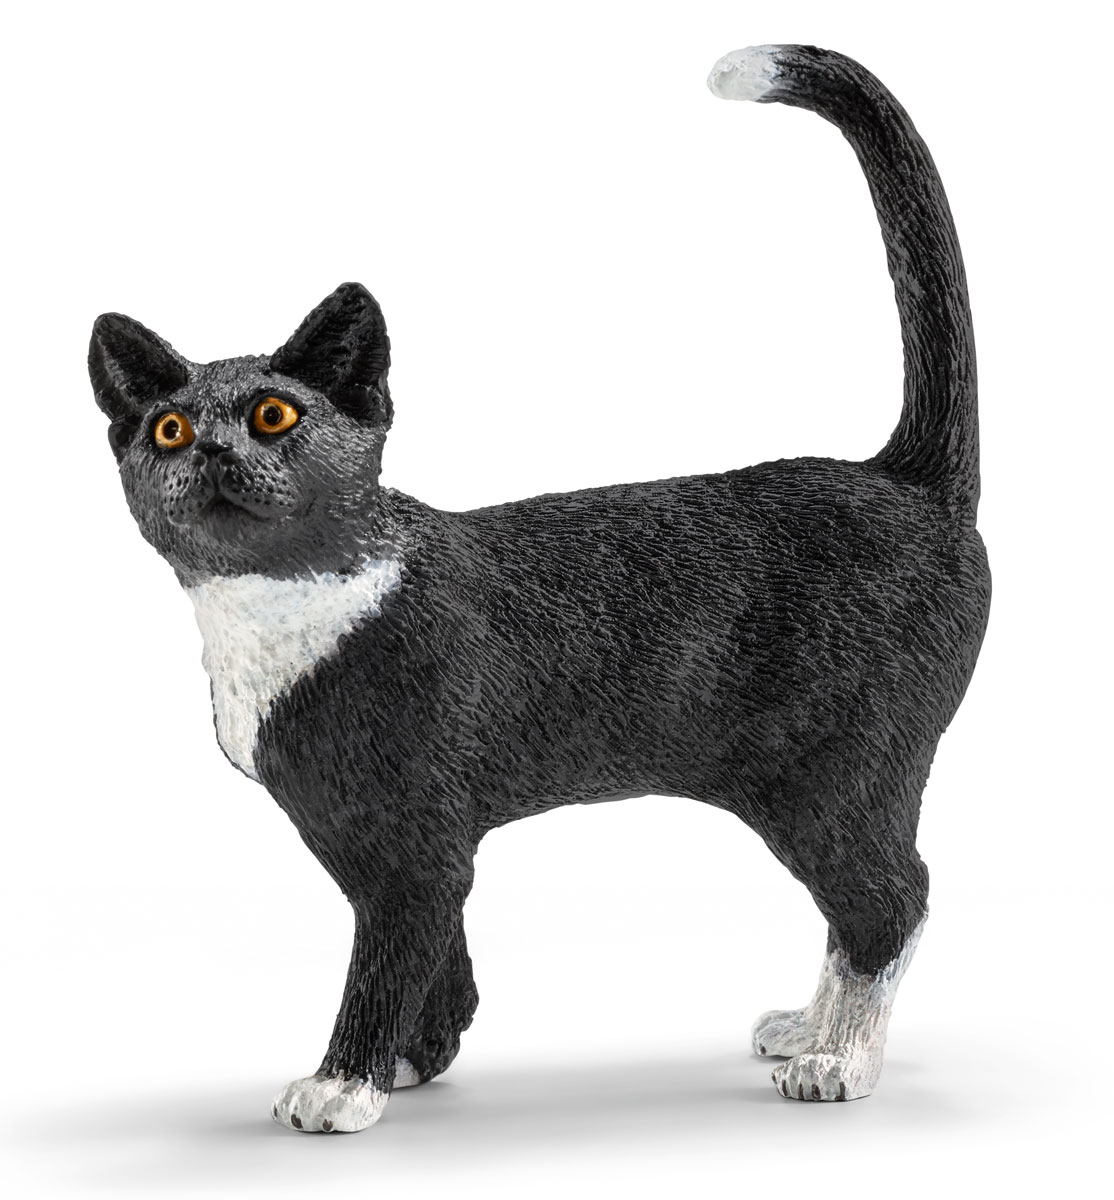 Schleich Фигурка Кошка цвет черный белый schleich фигурка черная пантера